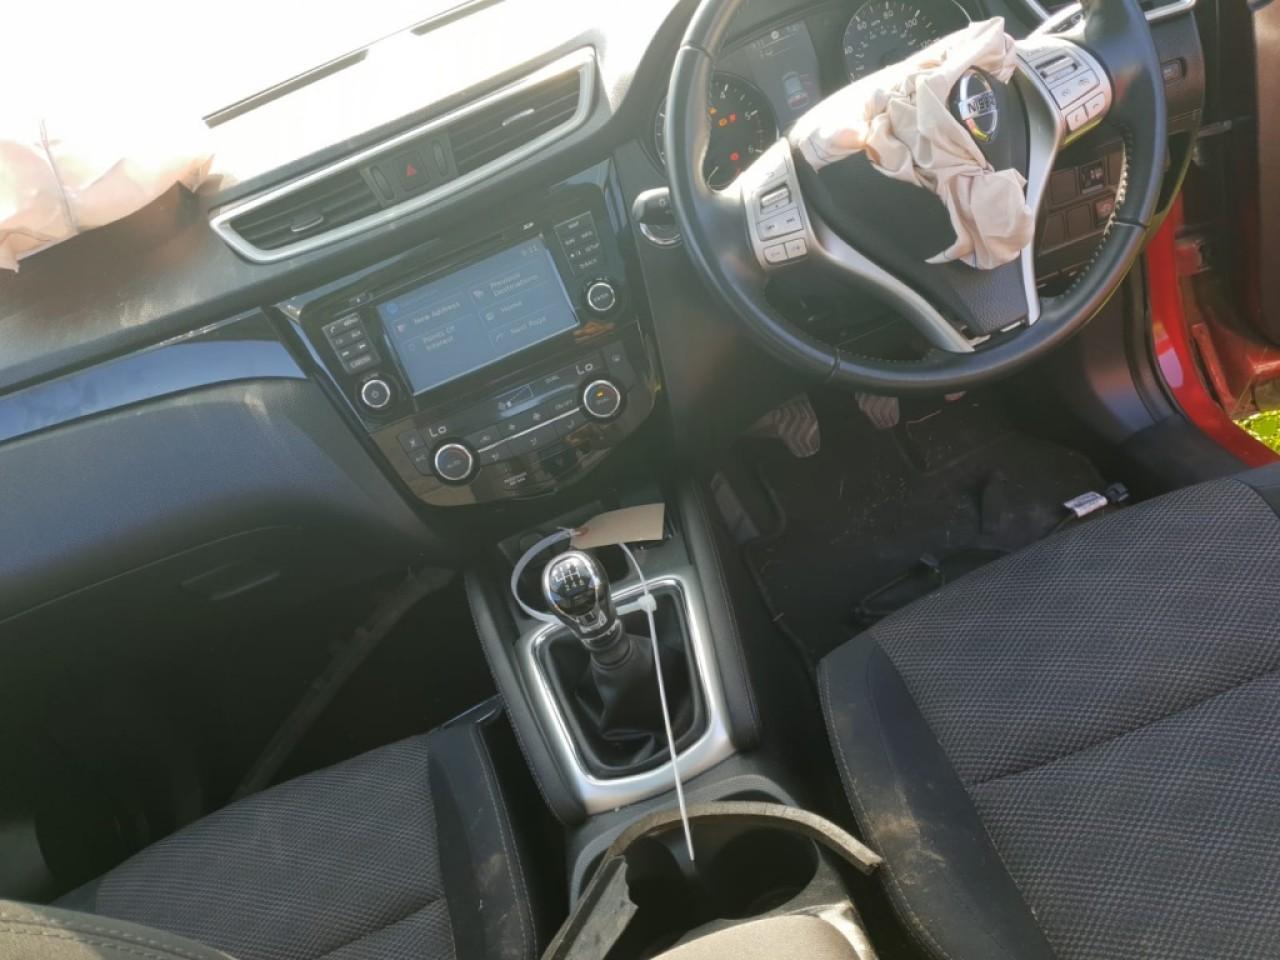 Fuzeta dreapta fata Nissan Qashqai 2014 SUV 1.5dci 1.5 dci